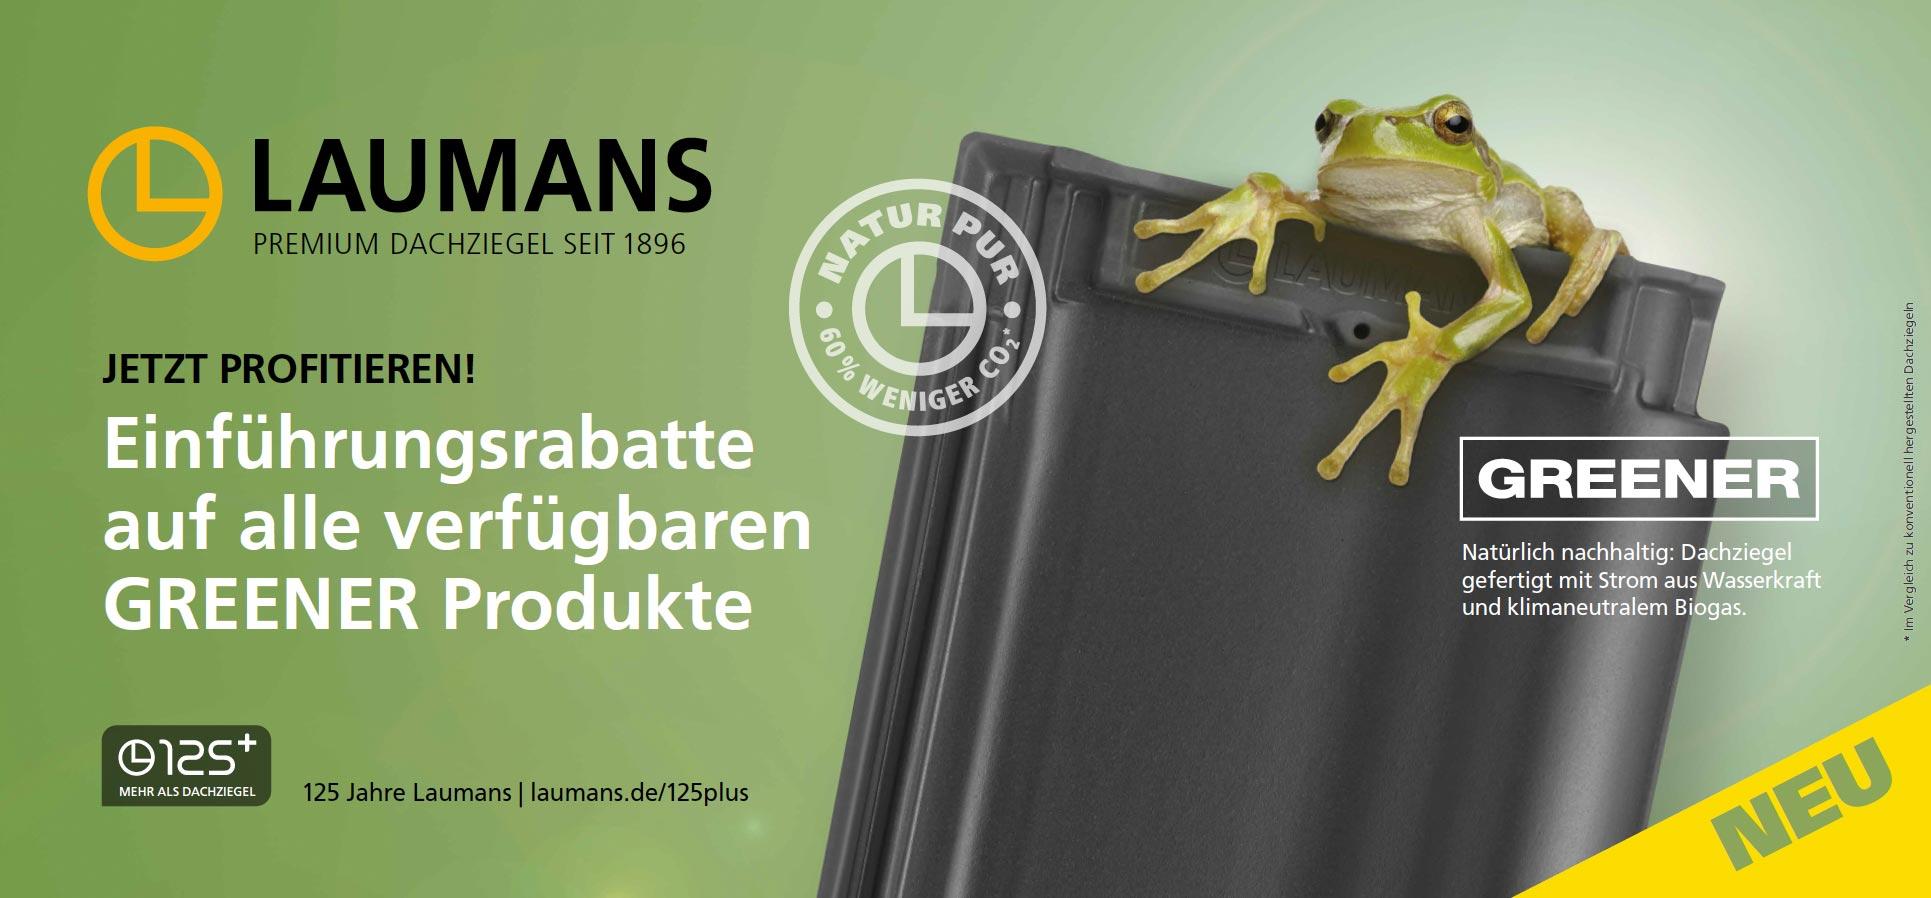 Laumans Greener Rabattaktion